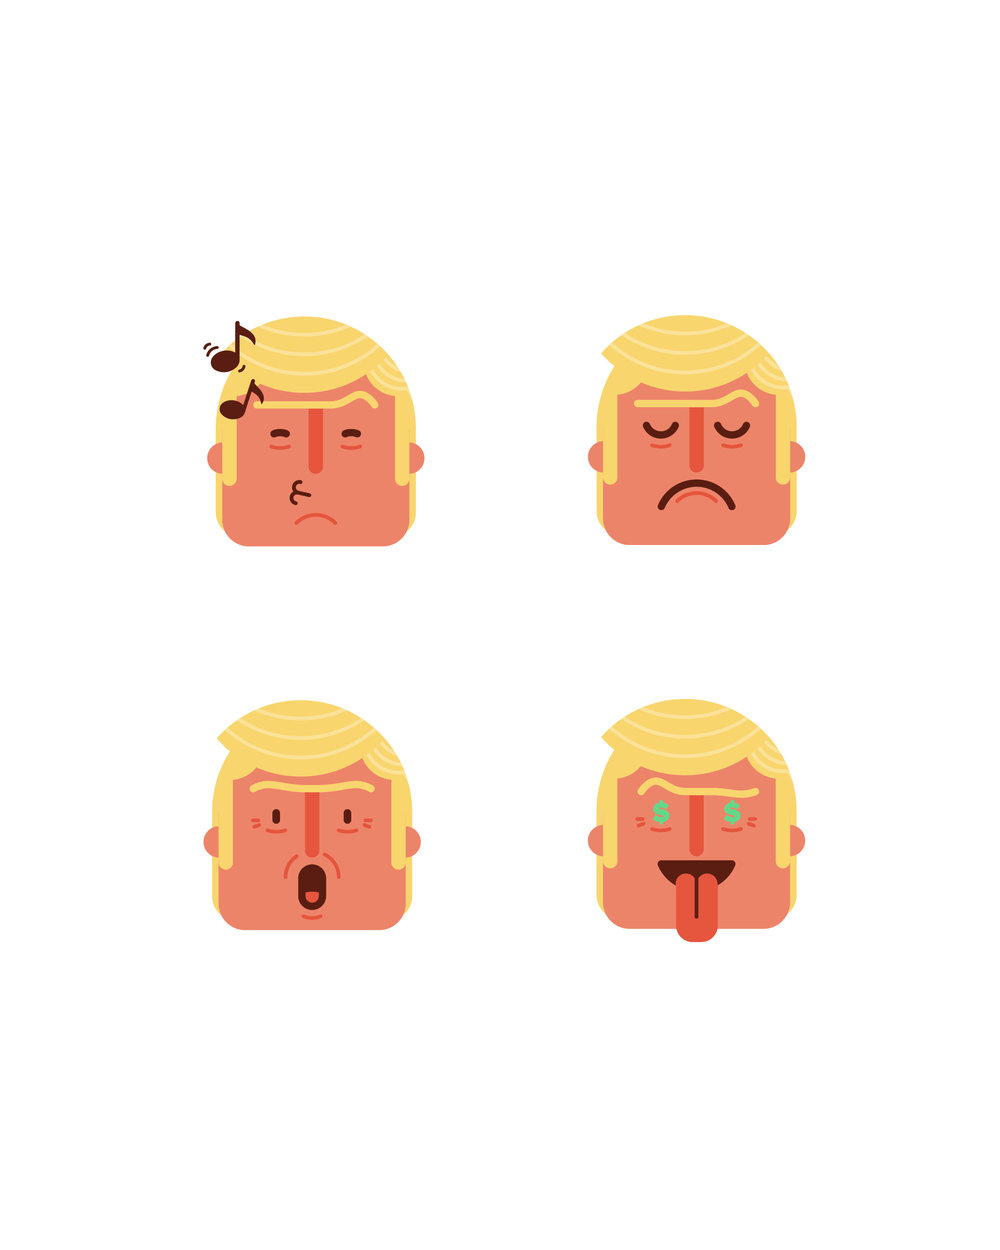 stickers-3.jpg